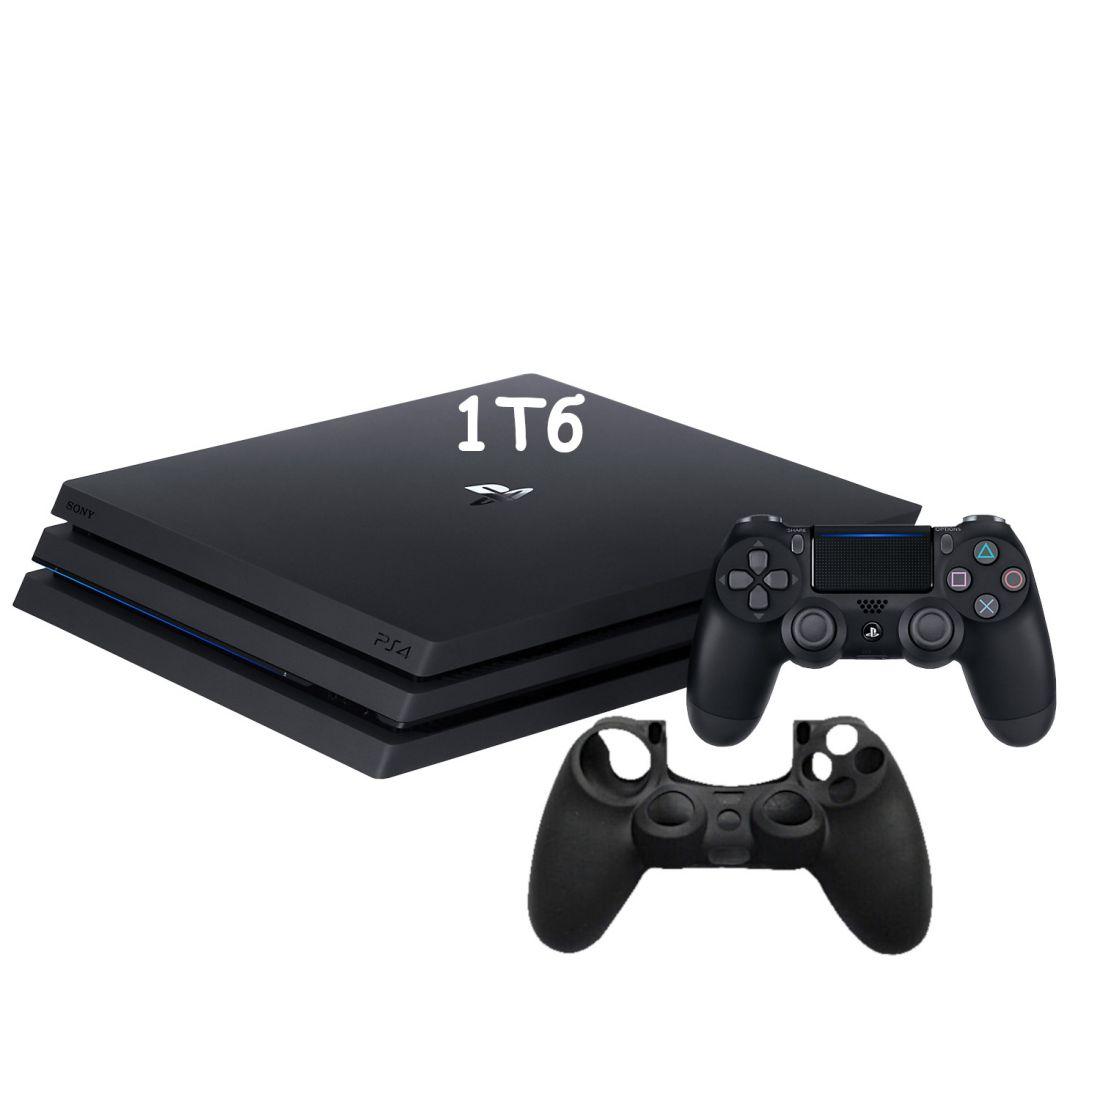 Sony PlayStation 4 Pro 1Tb + Игра Horizon Zero Dawn + Защитный чехол на джойстик из силикона